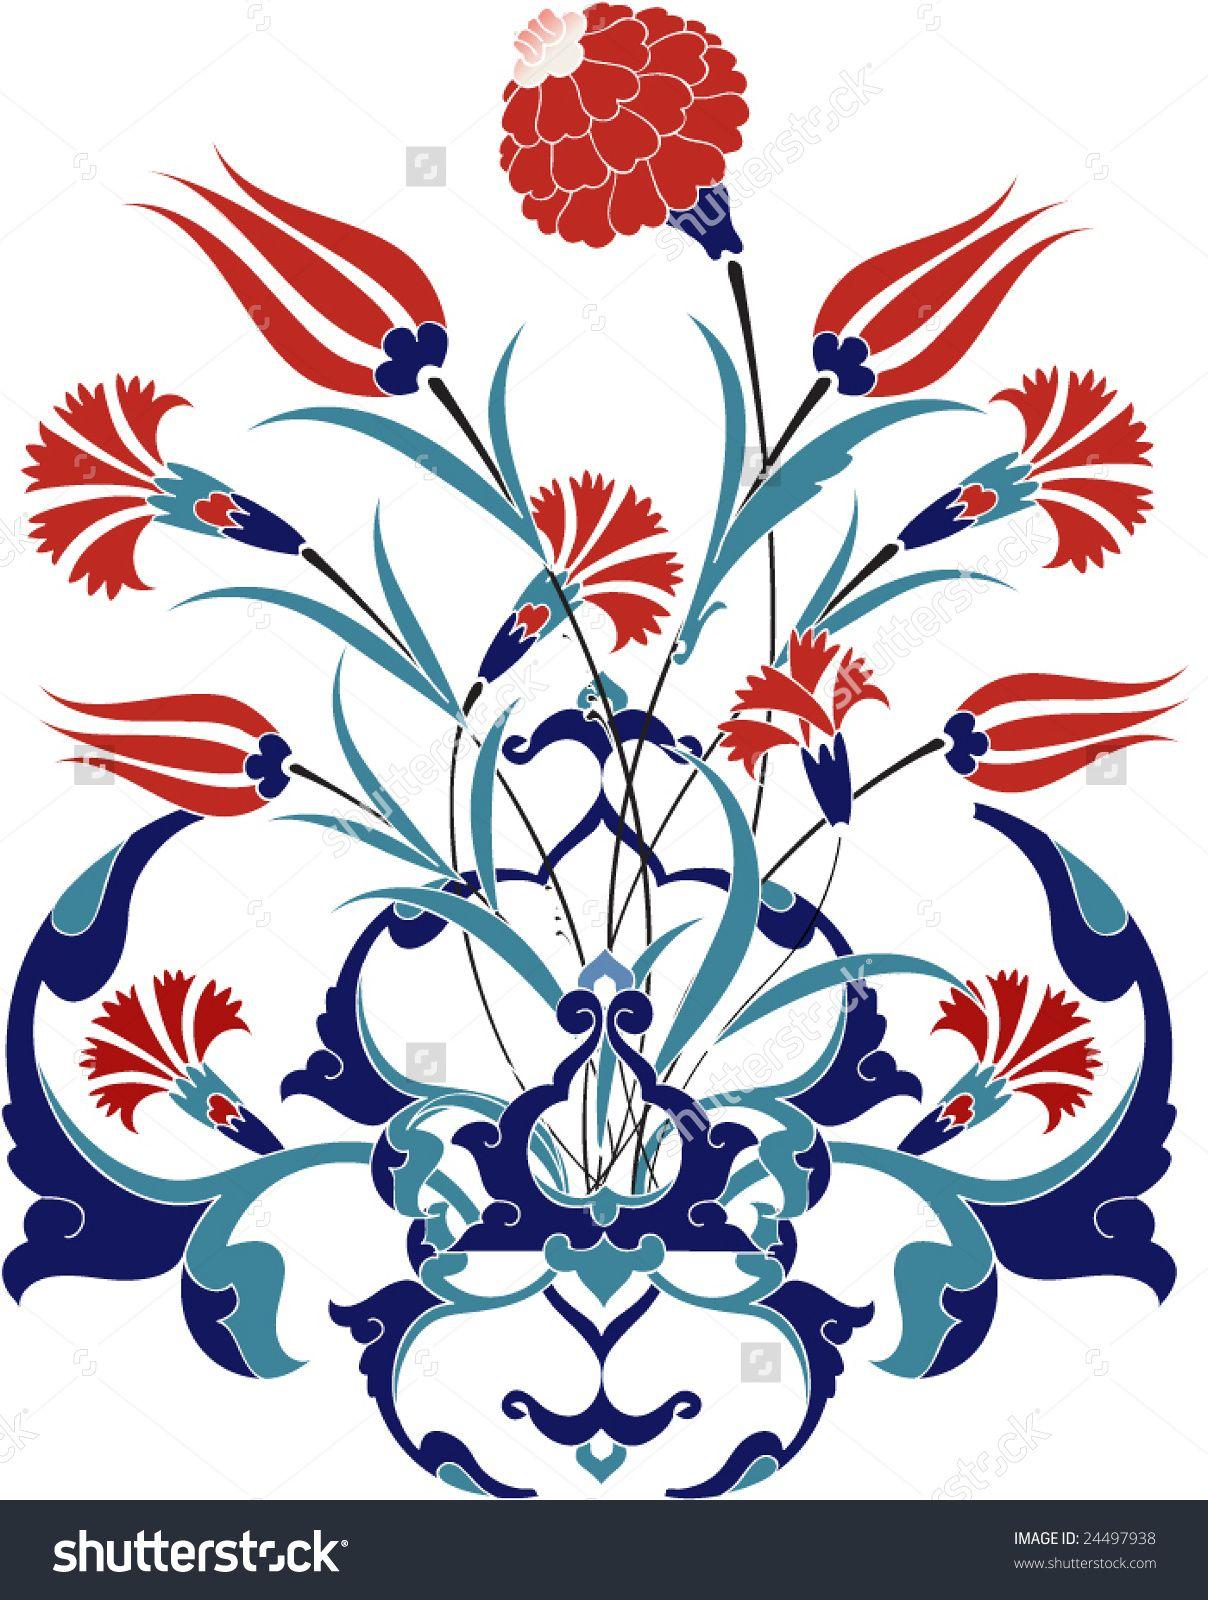 Traditional Ottoman Turkey Turkish Tulip Tile Design Tablolar Sanat Cizimler